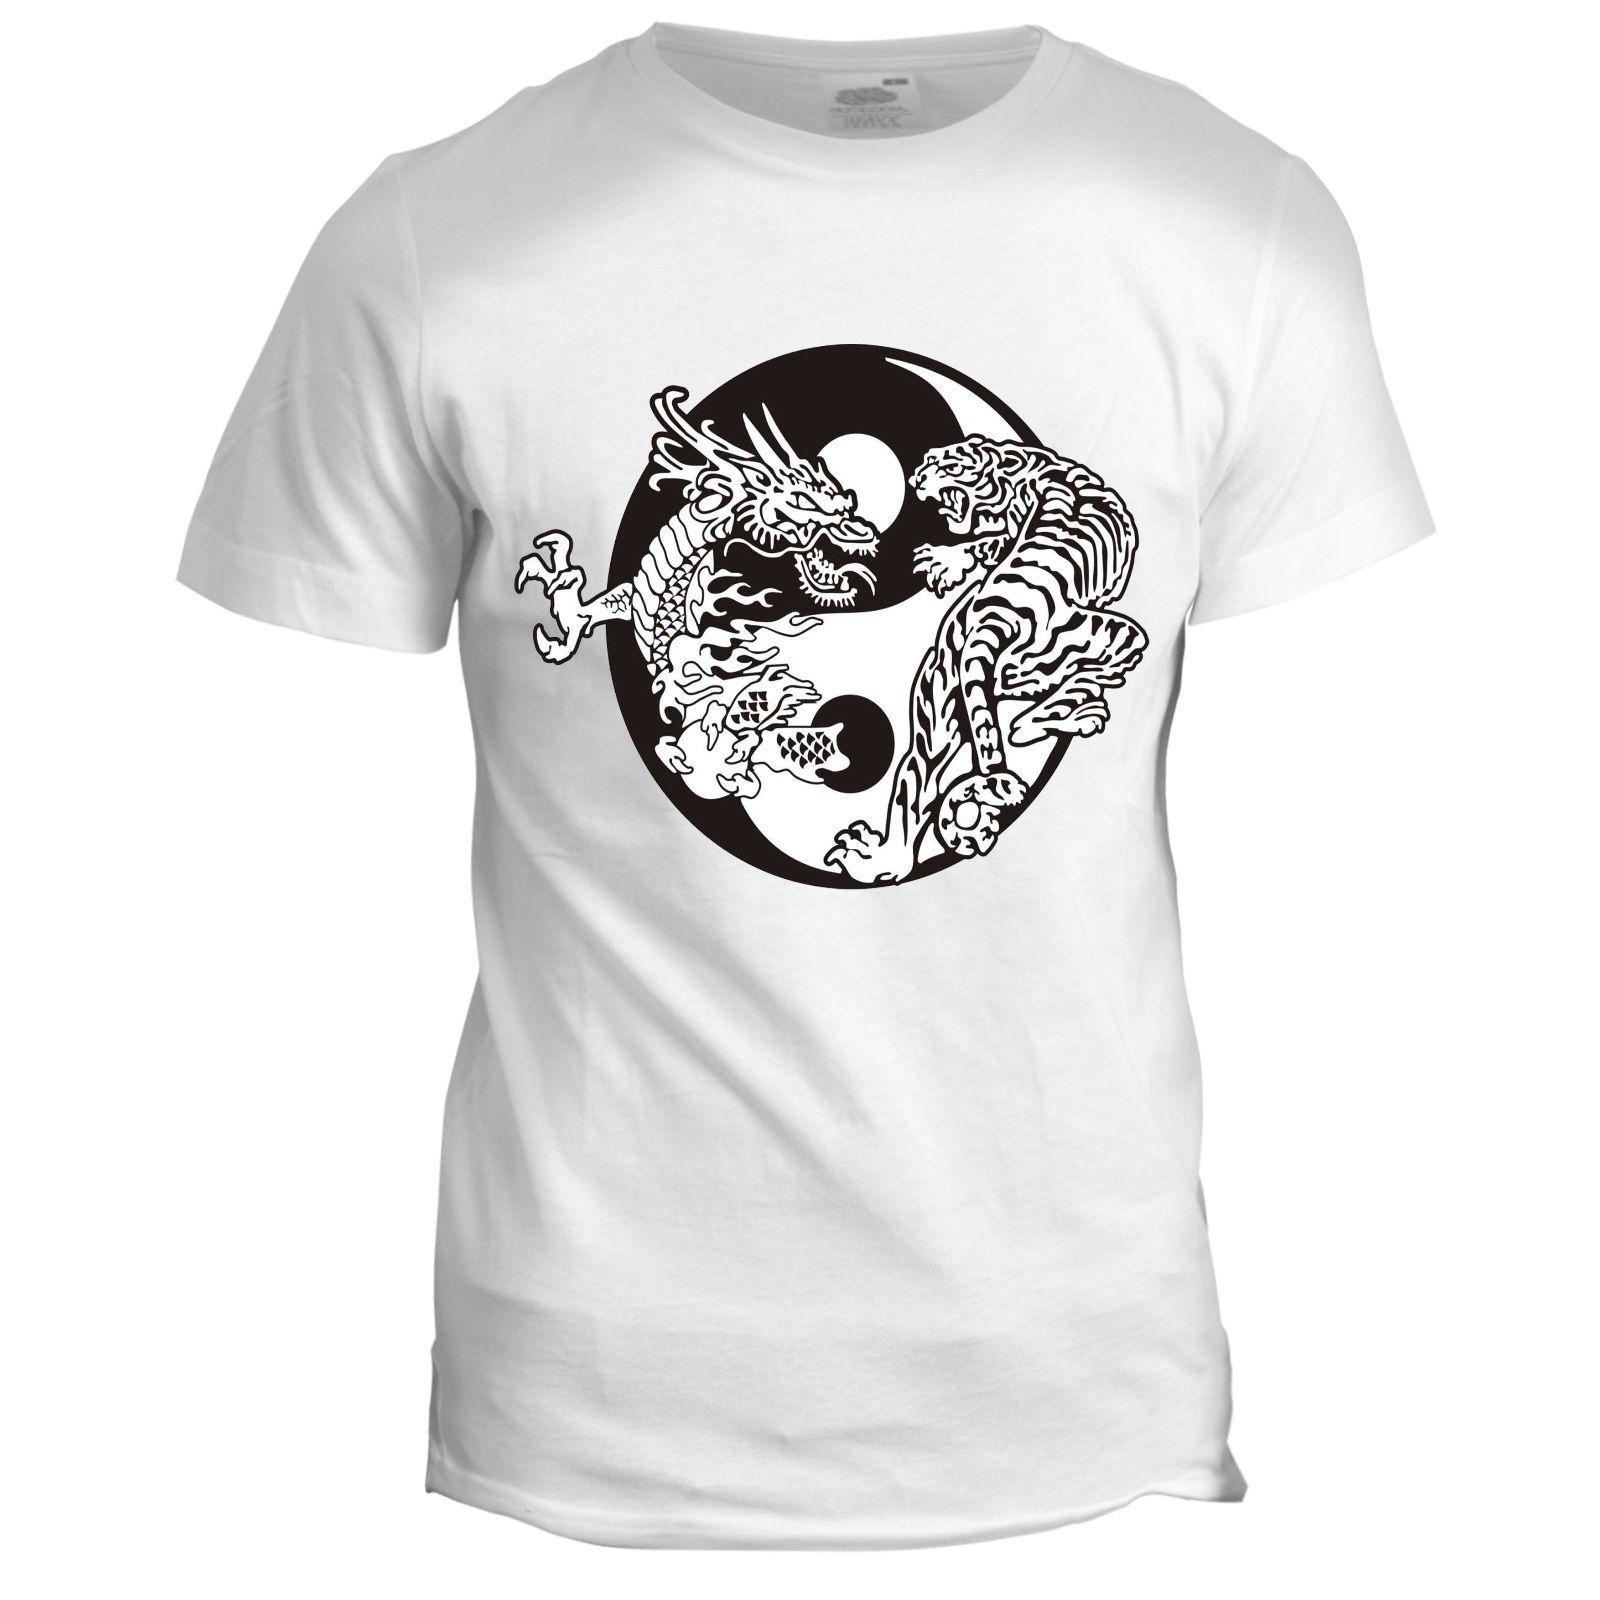 7c800ae27ea6 Chinese Yin Yang Dragon Inspired Japanese Tiger Martial Arts T Shirt Cool  Casual Pride T Shirt Men Unisex New Fashion Tshirt Loose Size T Shirt T  Shirts ...